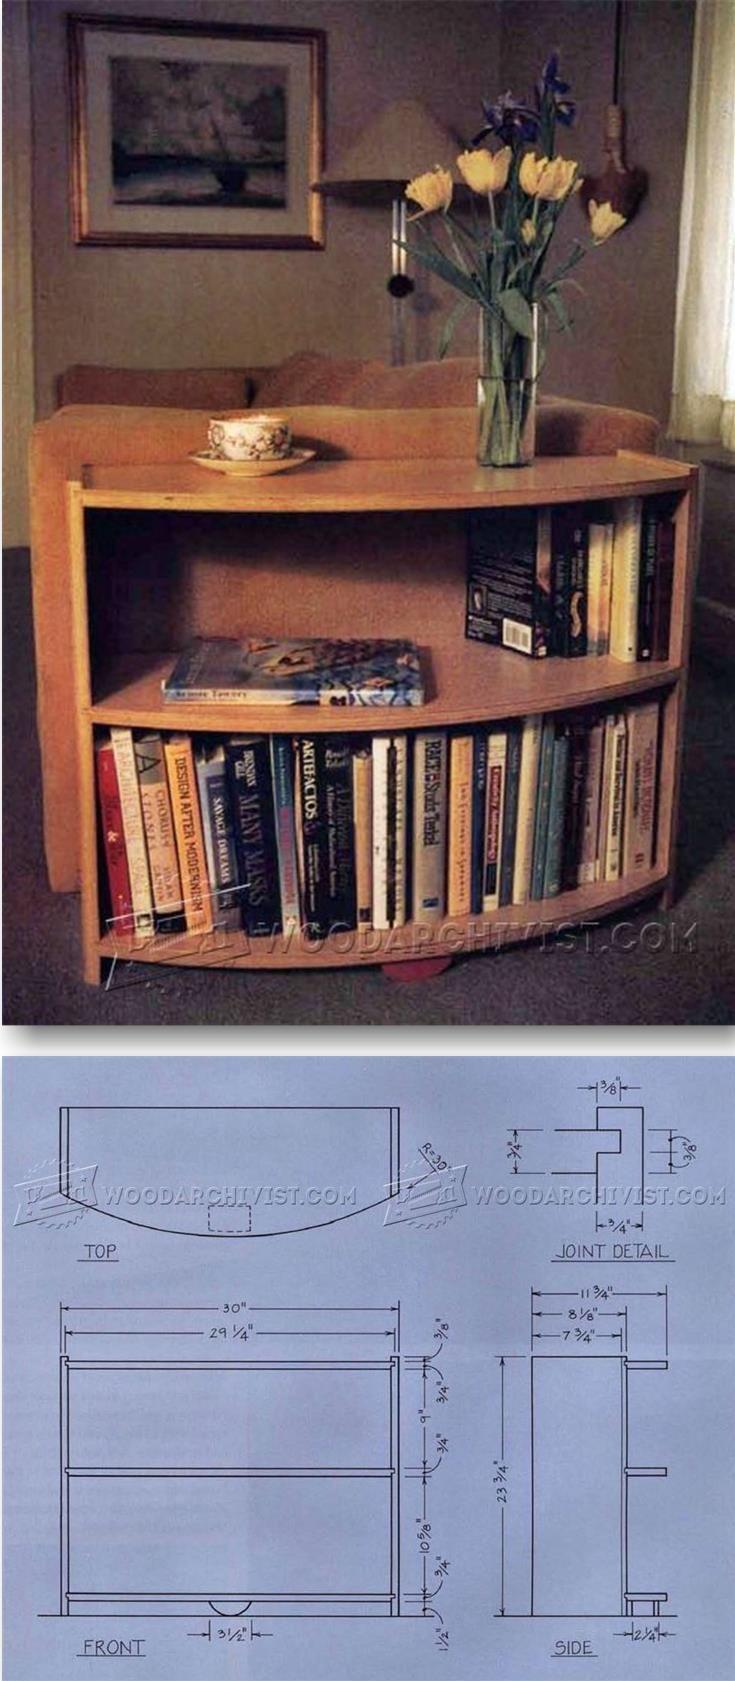 1000 ideas about bookcase plans on pinterest bookshelf for Bookshelf chair plans